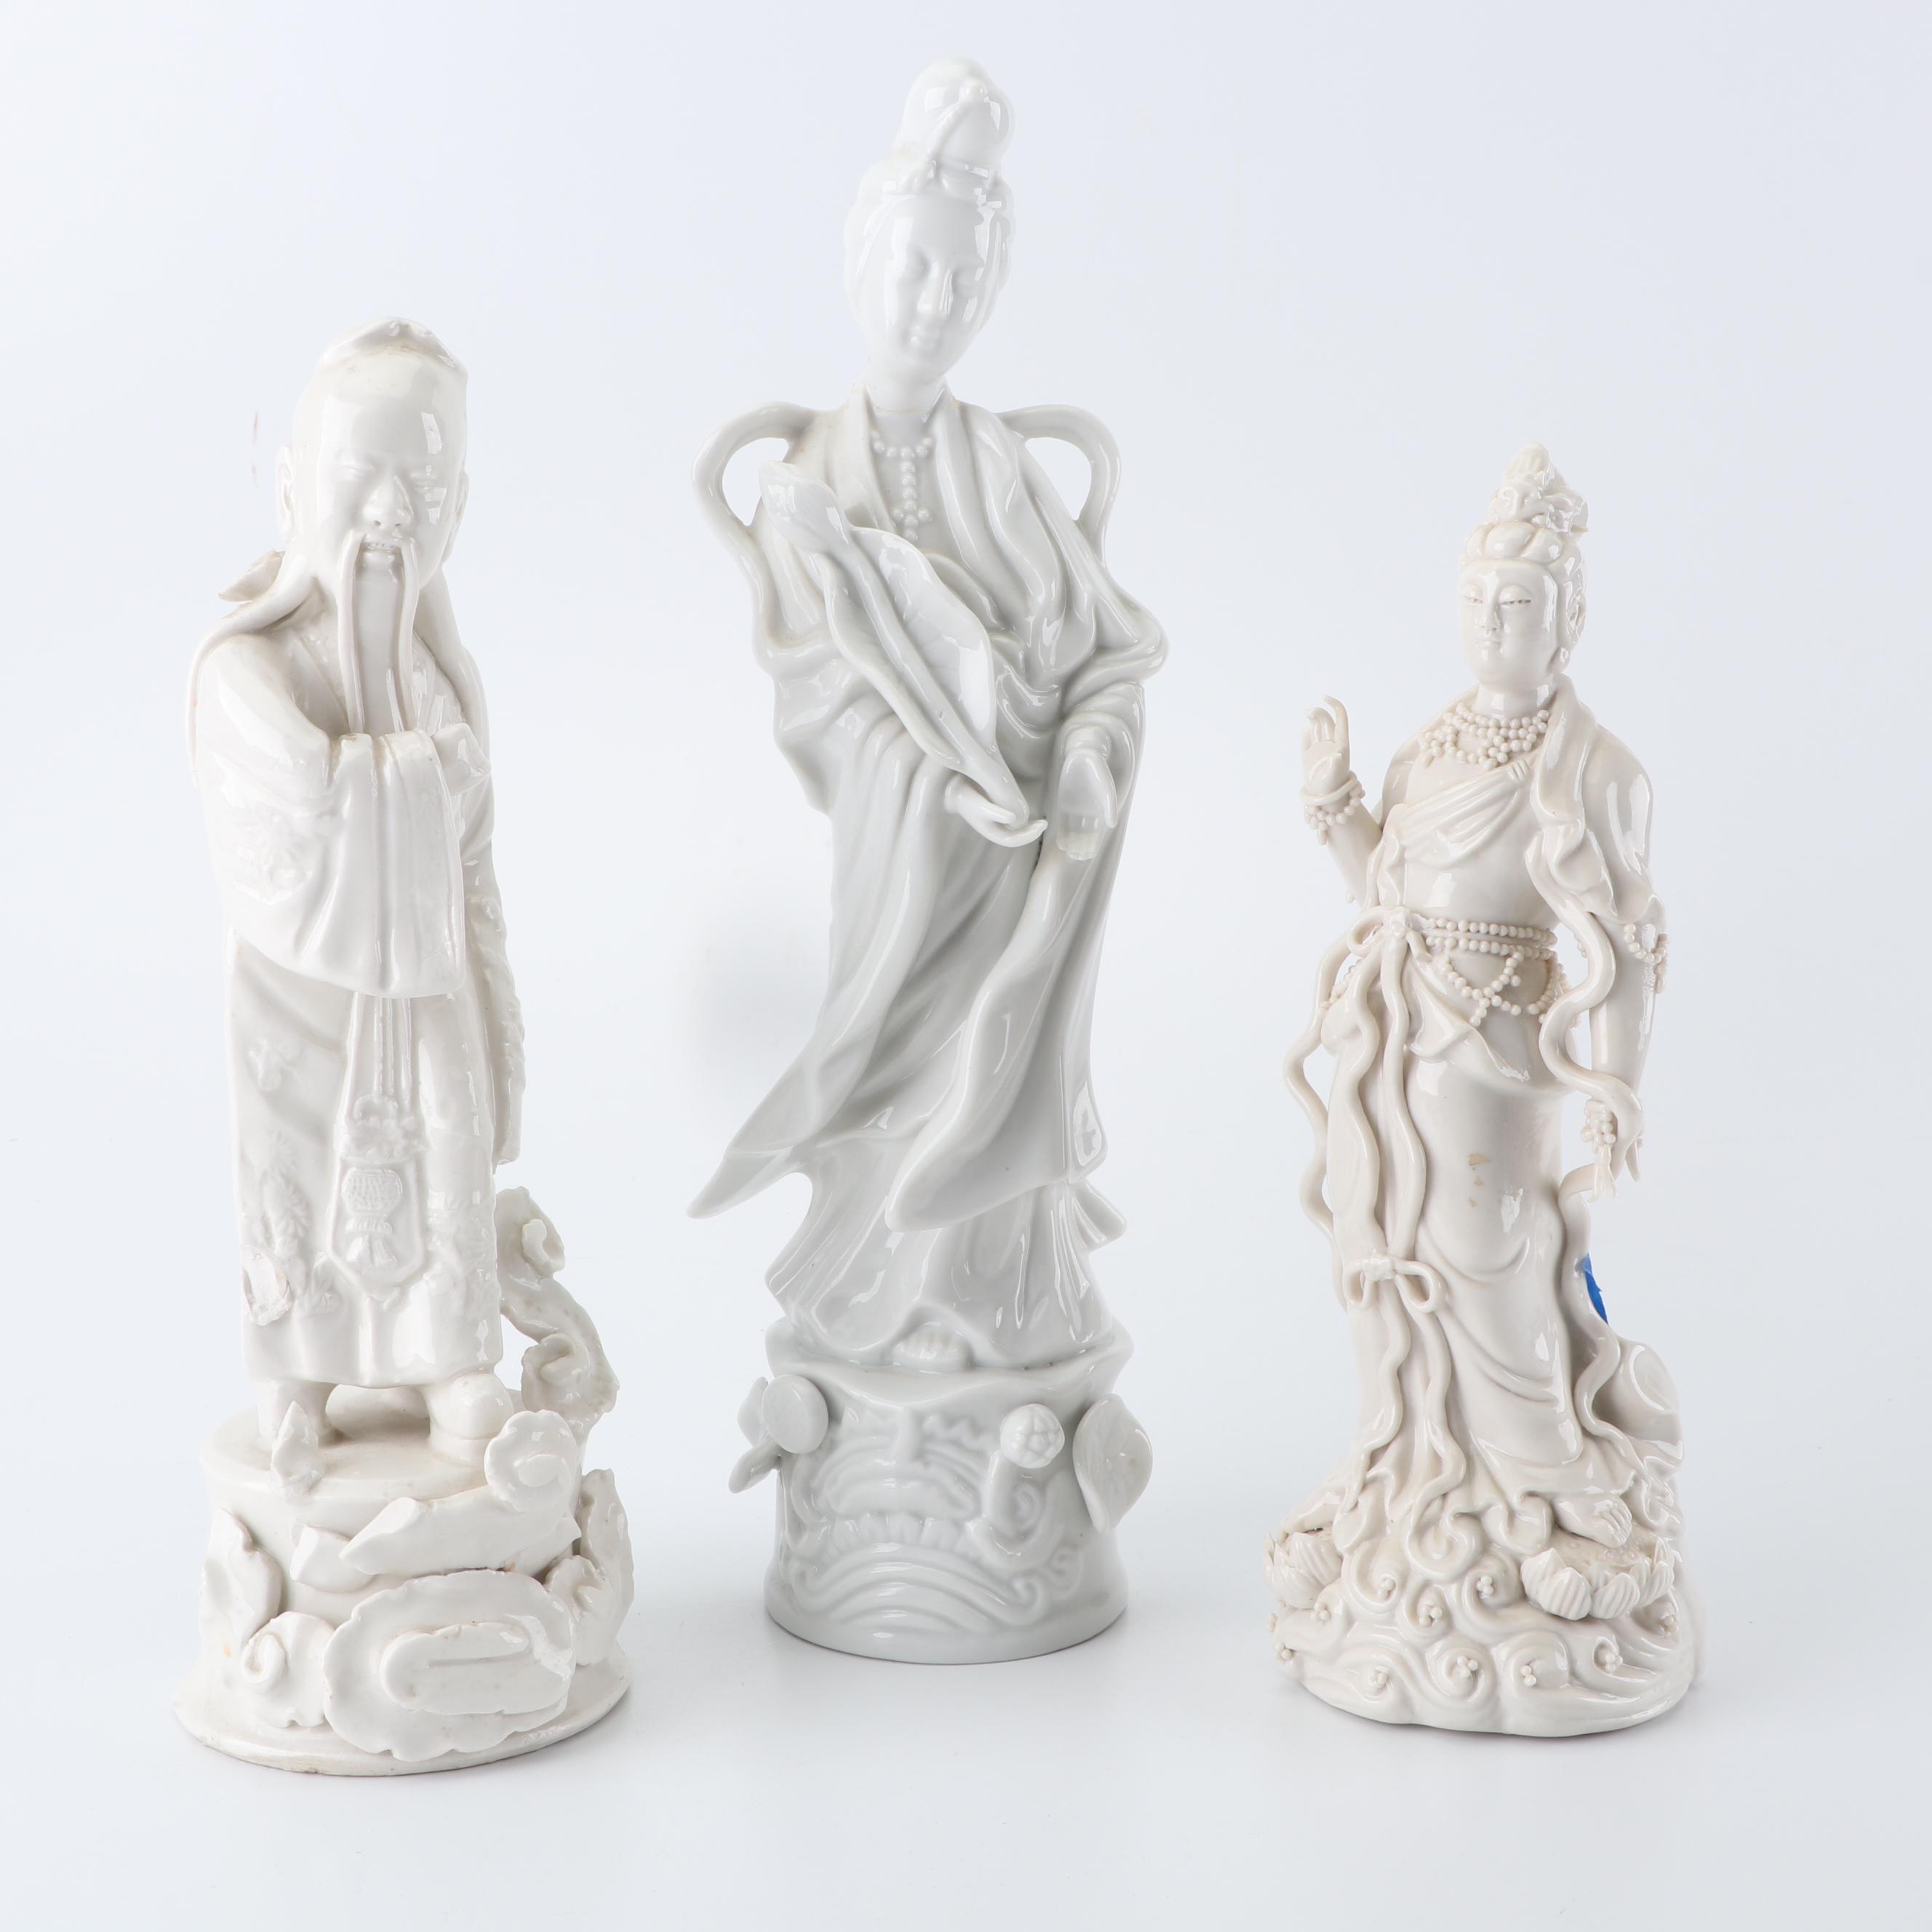 Blanc de Chine Porcelain Figurines Featuring Homco